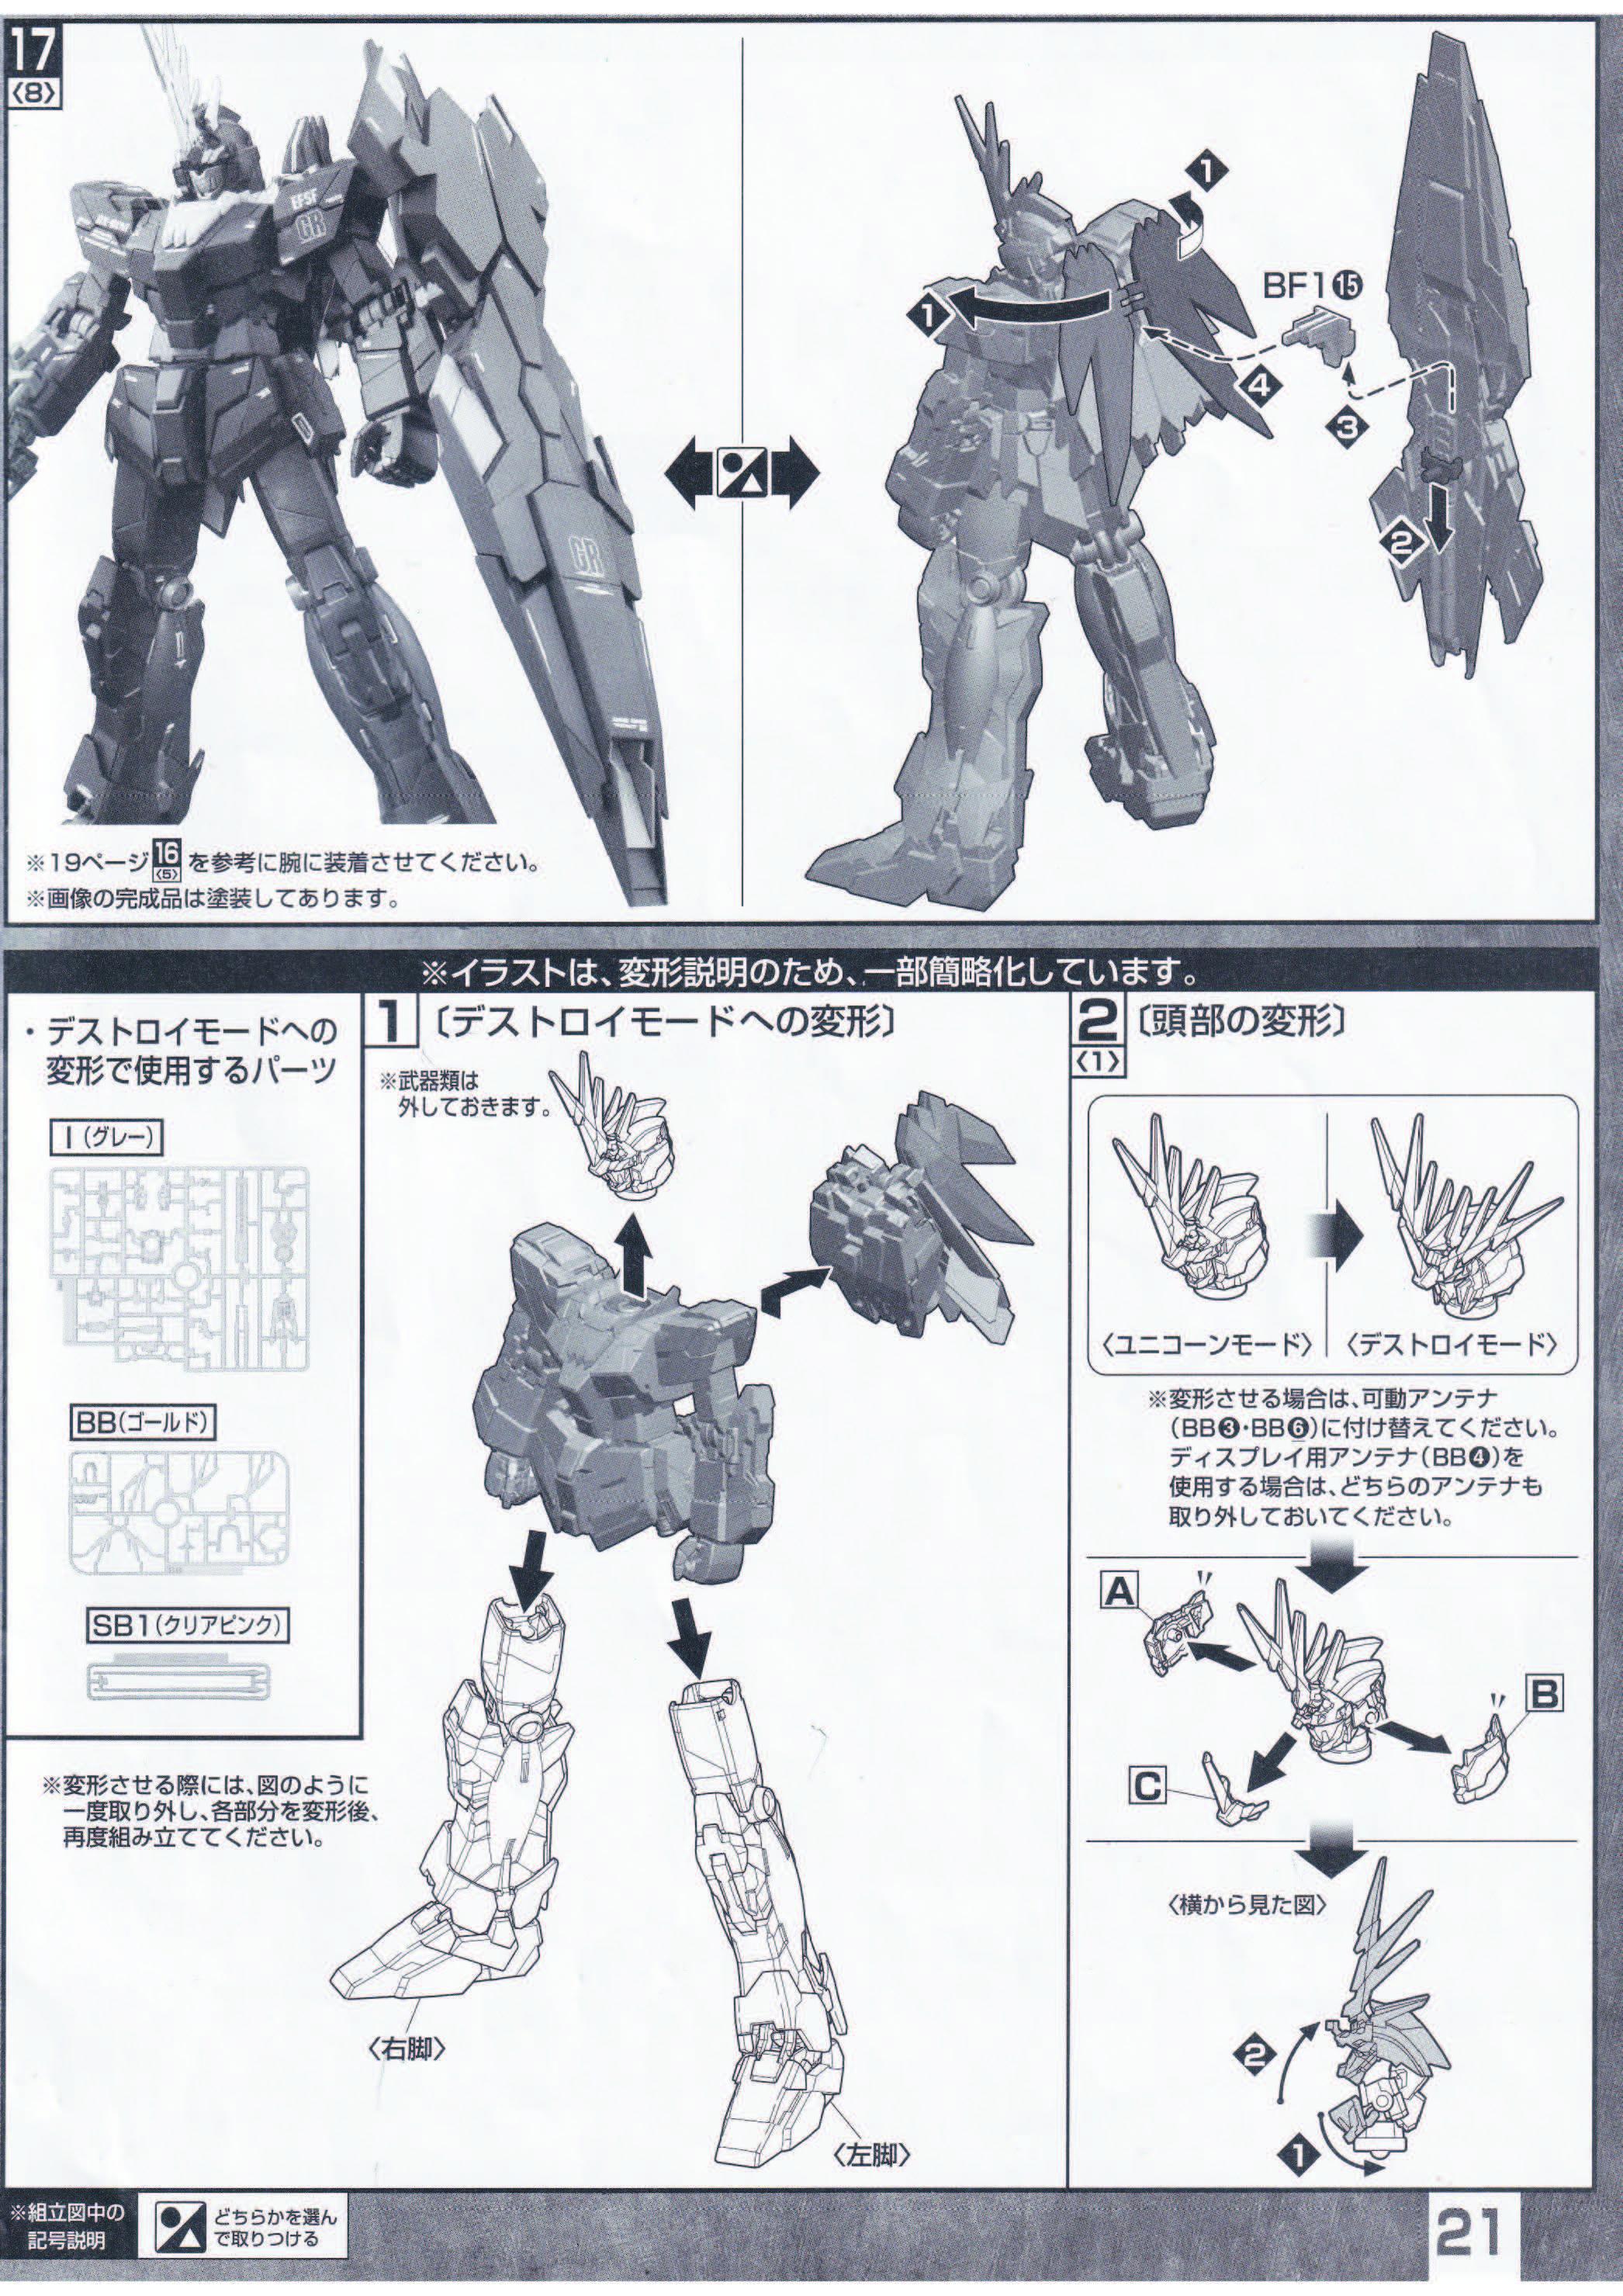 G383_info_weapons_ページ_12